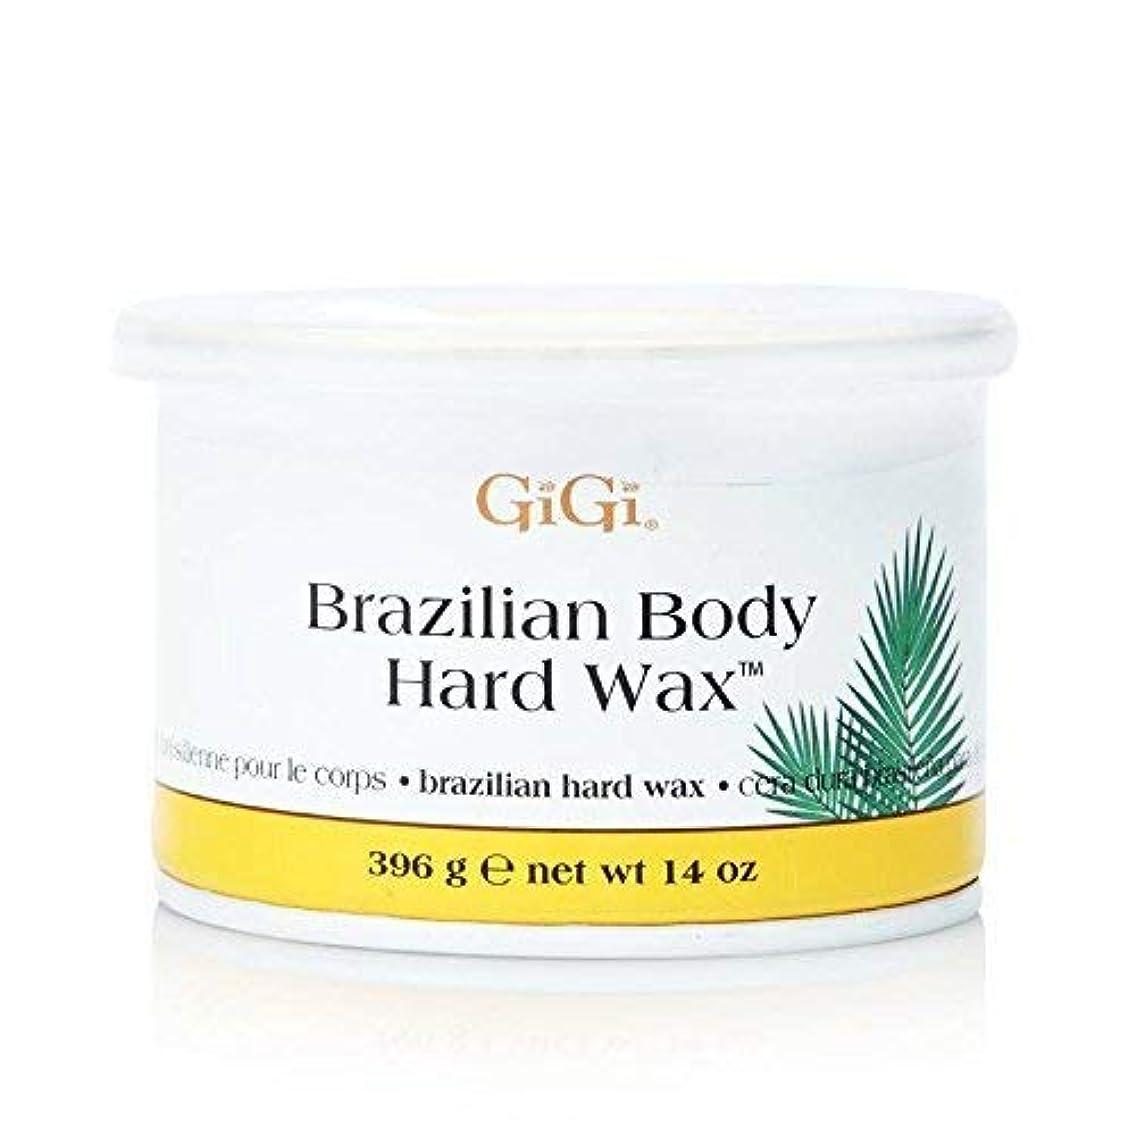 GiGi Brazilian Body Hard Wax 14ounce